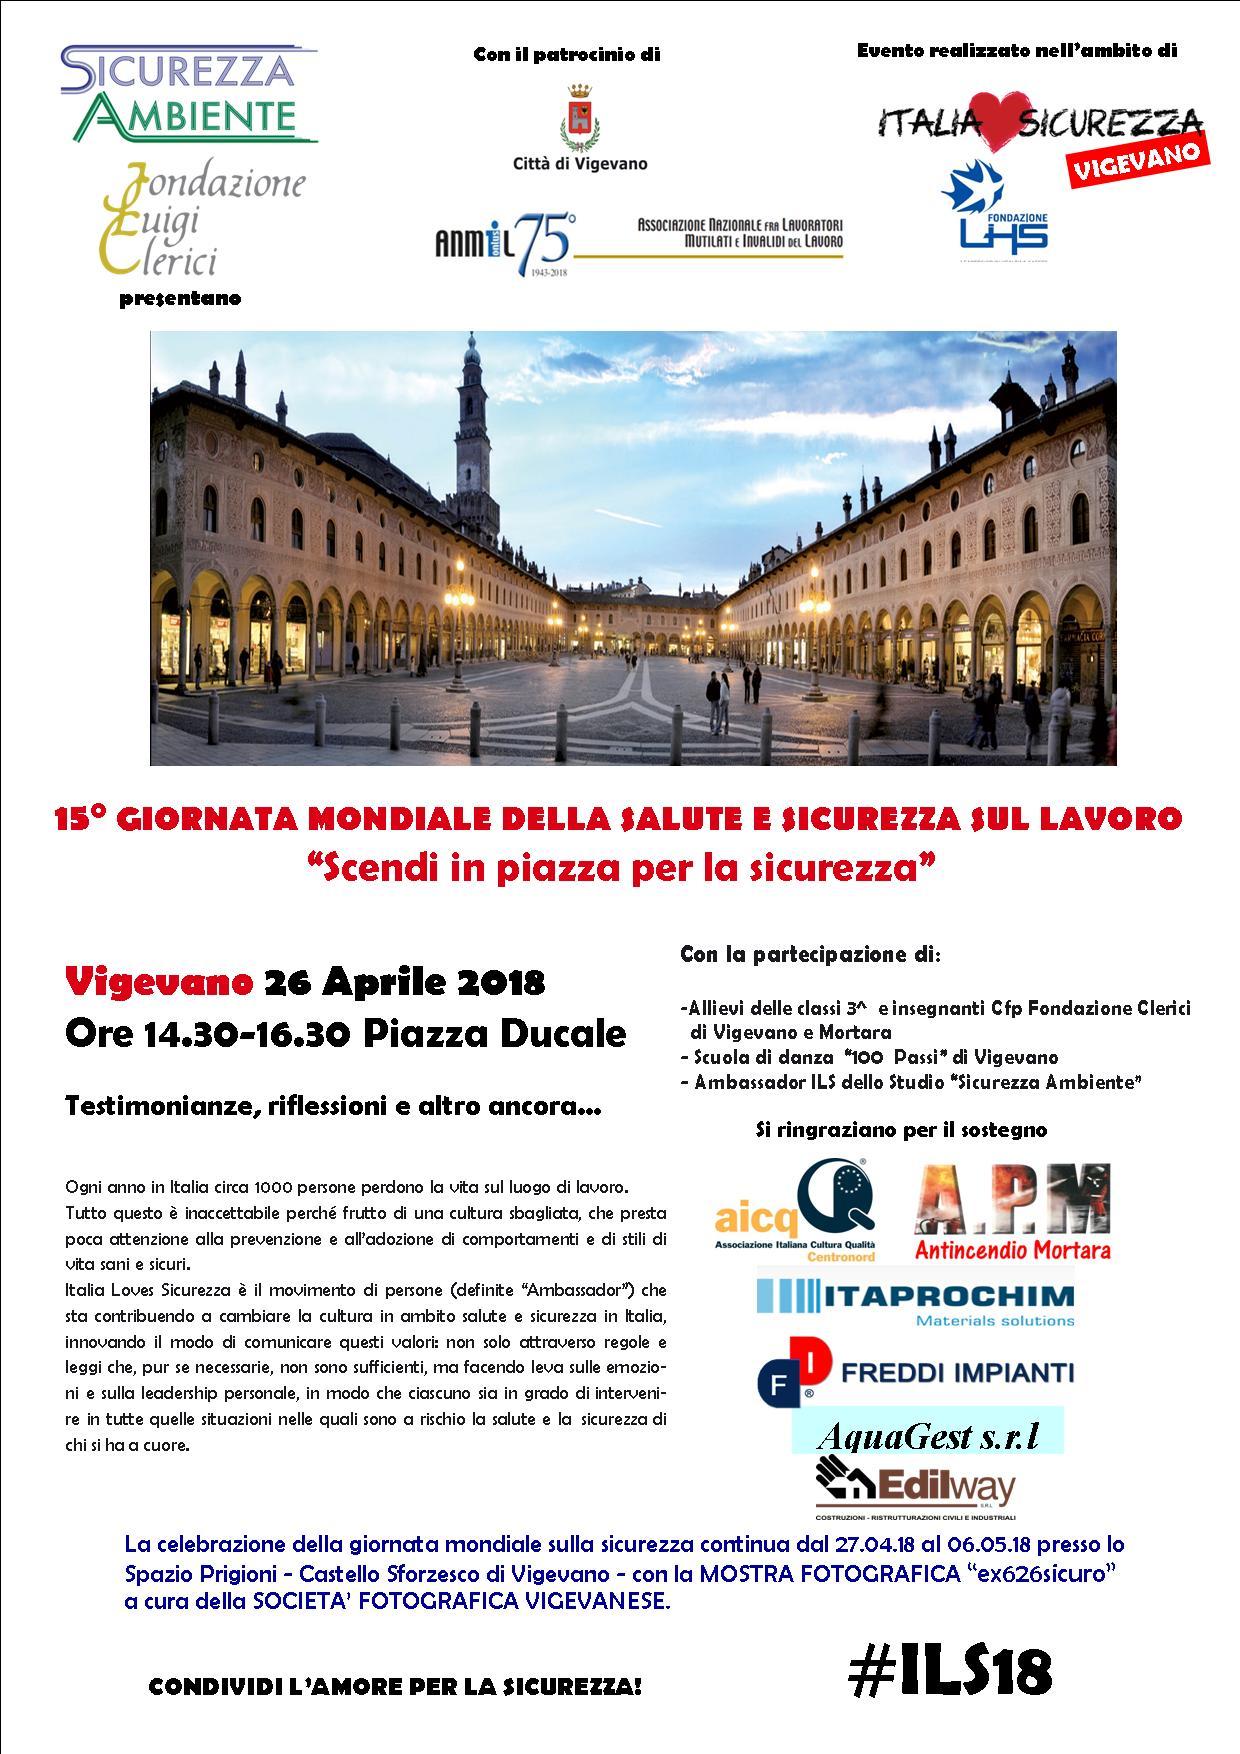 http://www.fondlhs.org/wp-content/uploads/2018/04/poster-evento-ILS-rev-03-del-130418.jpg